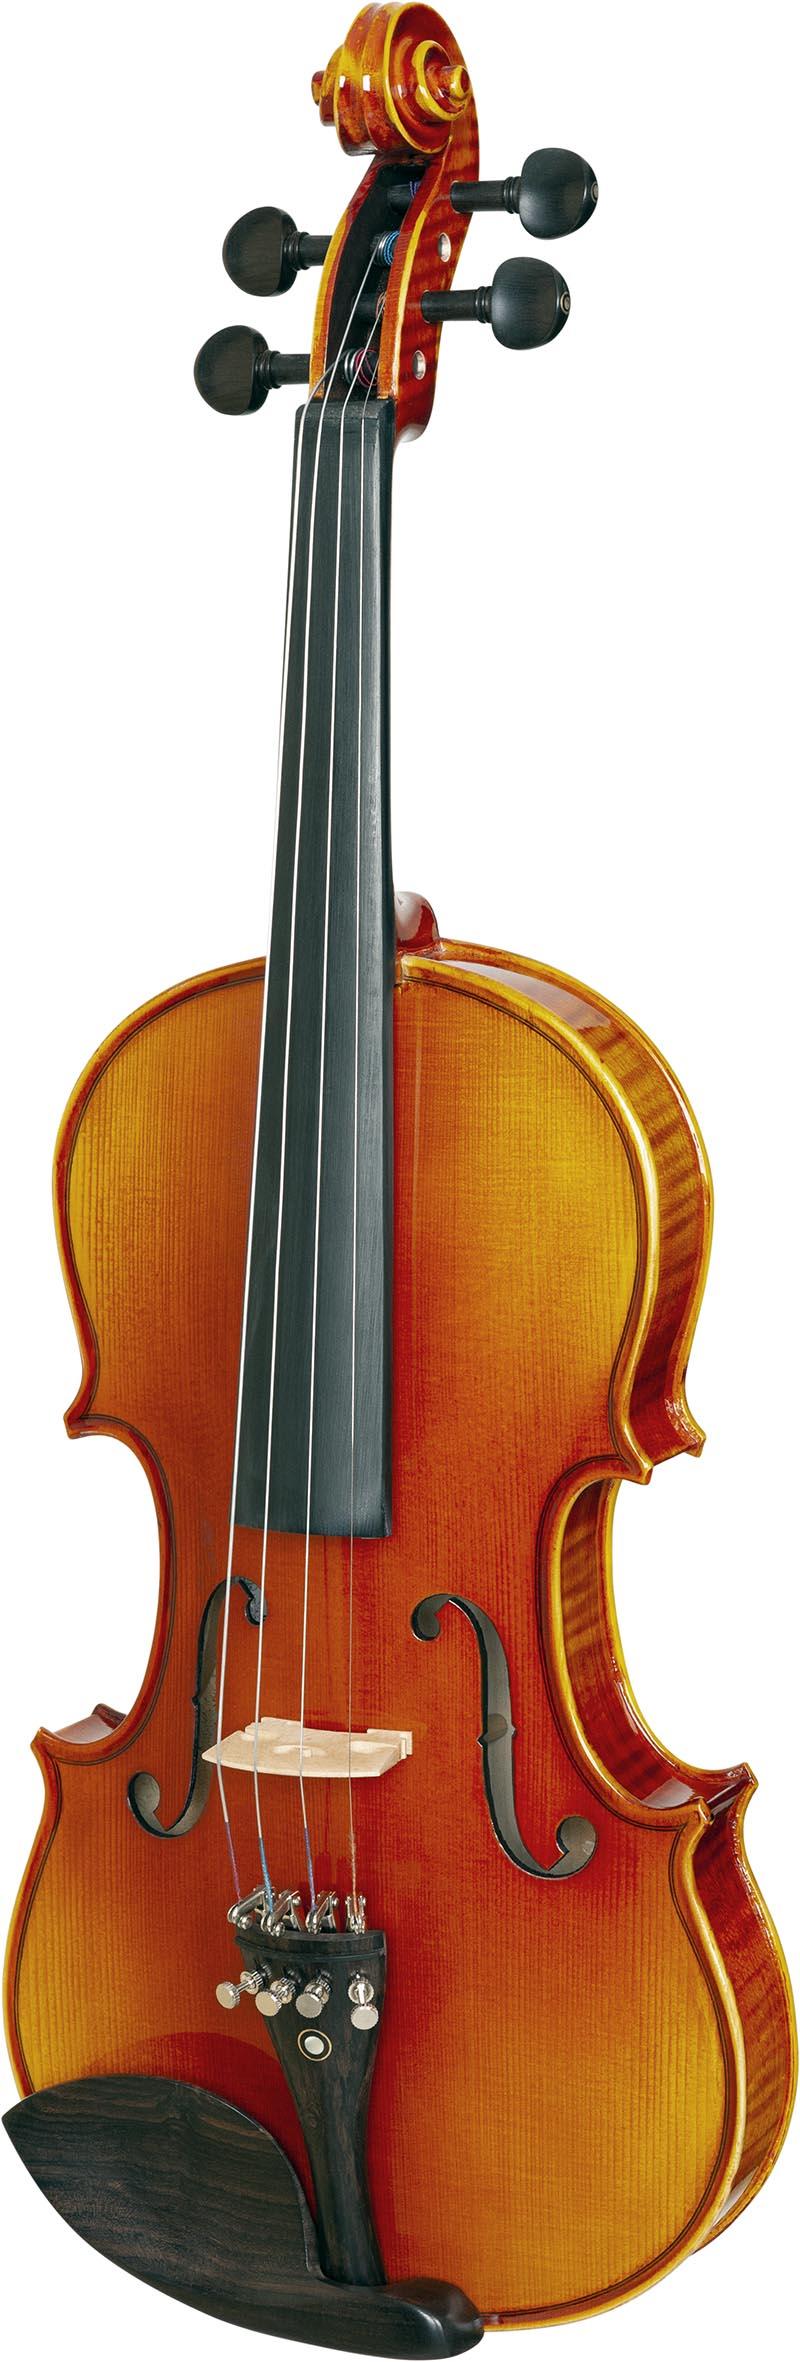 ve845 violino eagle ve845 visao frontal vertical